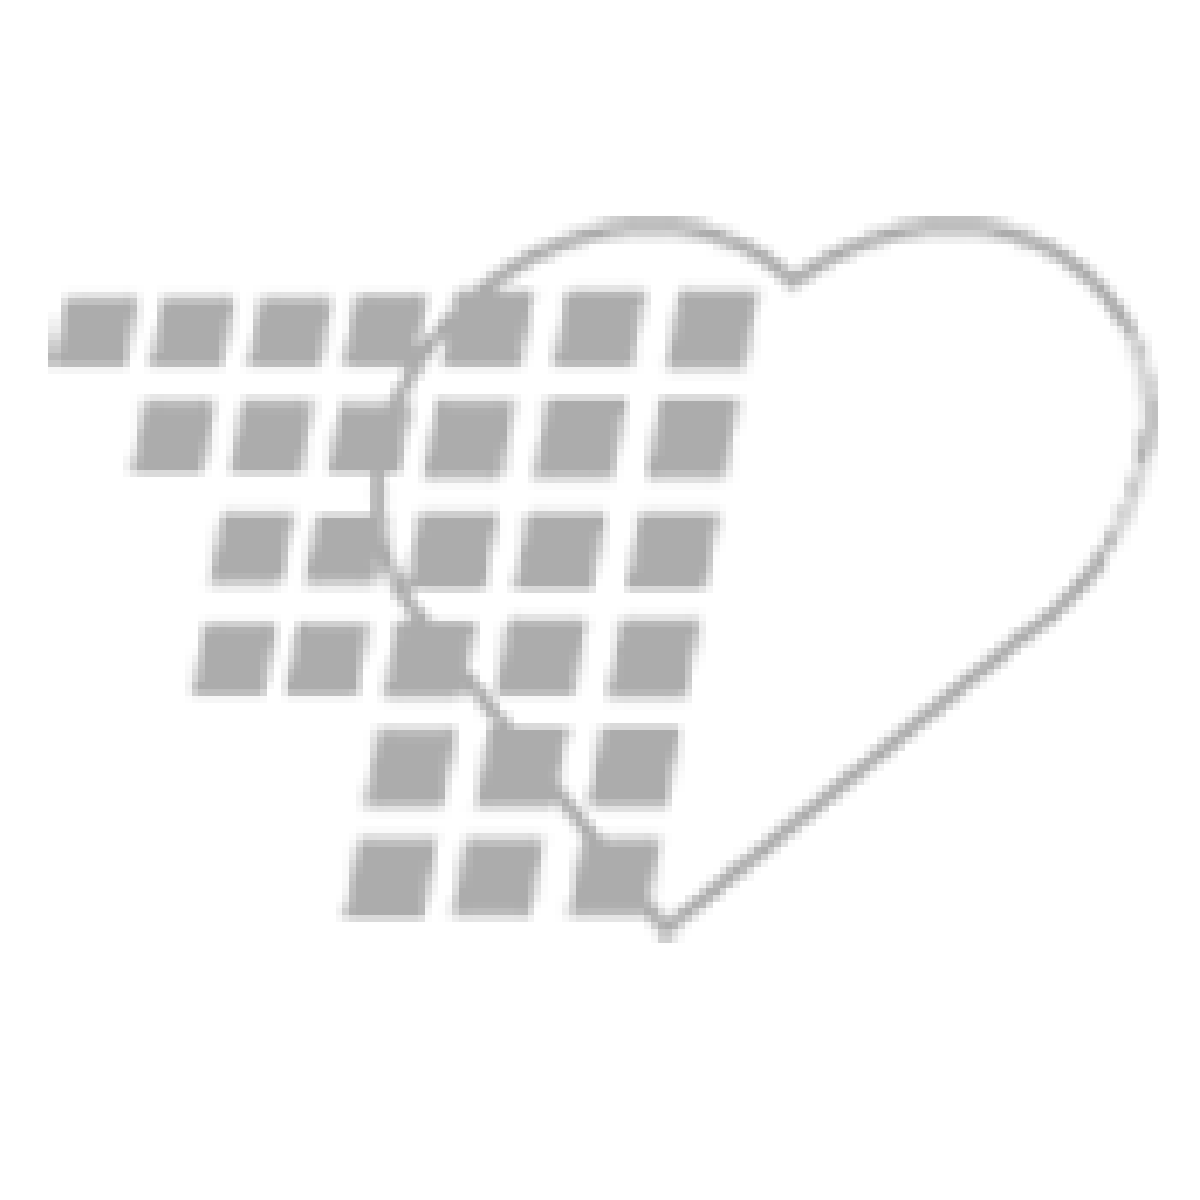 06-19-7746 Anaerobic Pulsator® Plus - Liquid Sodium Heparin 3 mL LL Syringe with Filter-Pro® Device